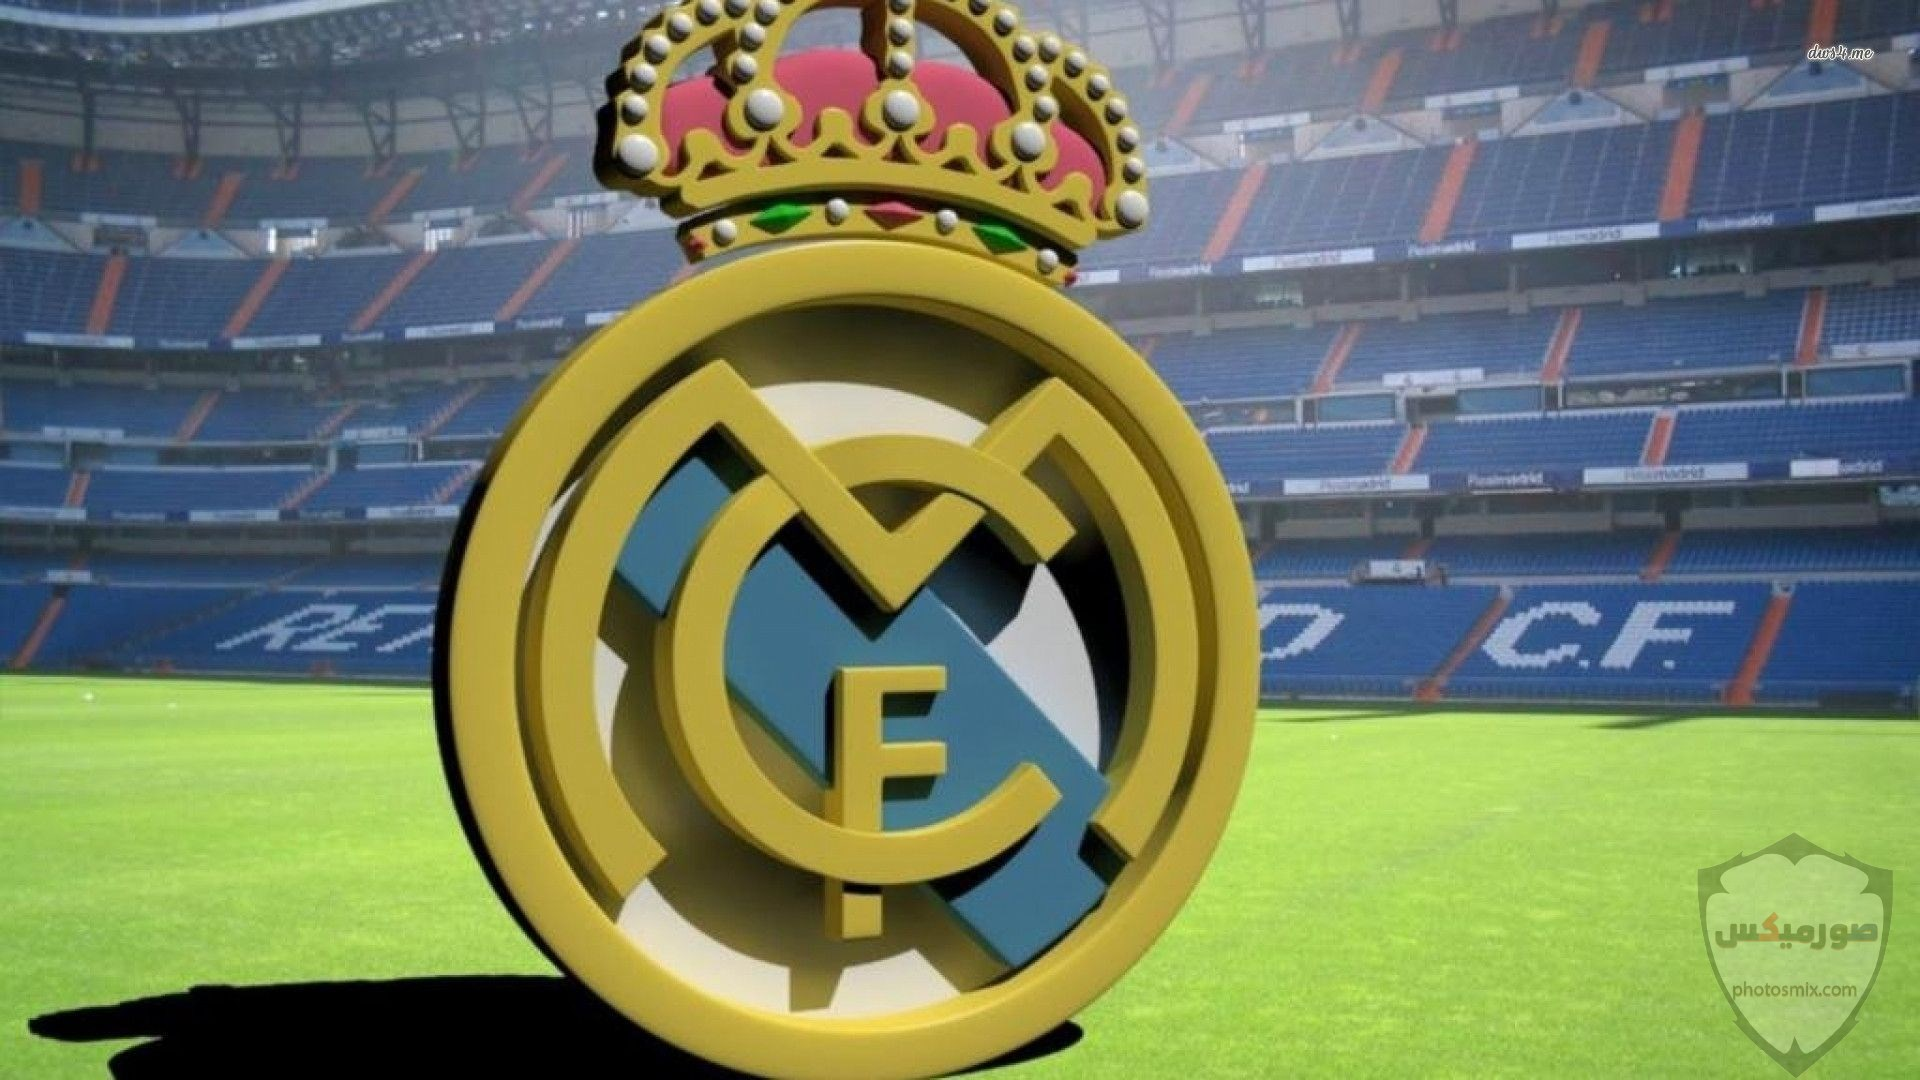 صور ريال مدريد 2020خلفيات ورمزيات ريال مدريد صور لاعبي ريال مدريد real madrid 40